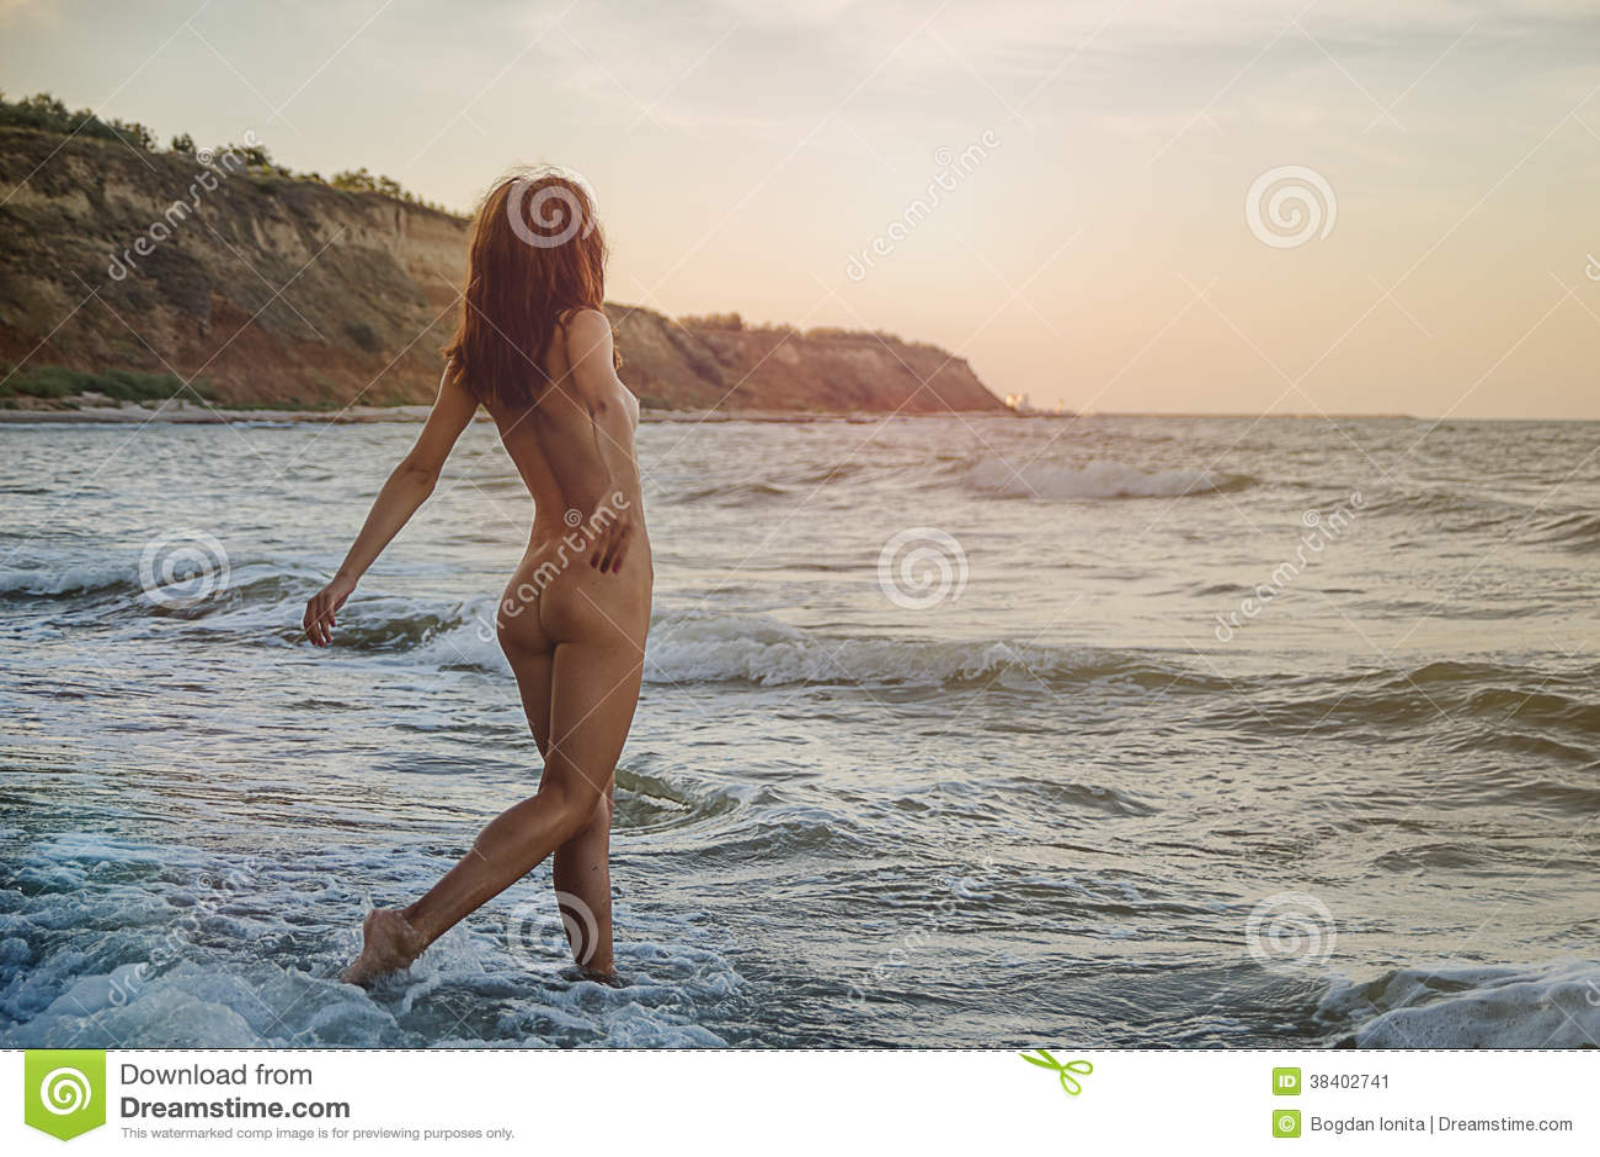 nude-beach-dancing-naked-mulatto-brazilian-girls